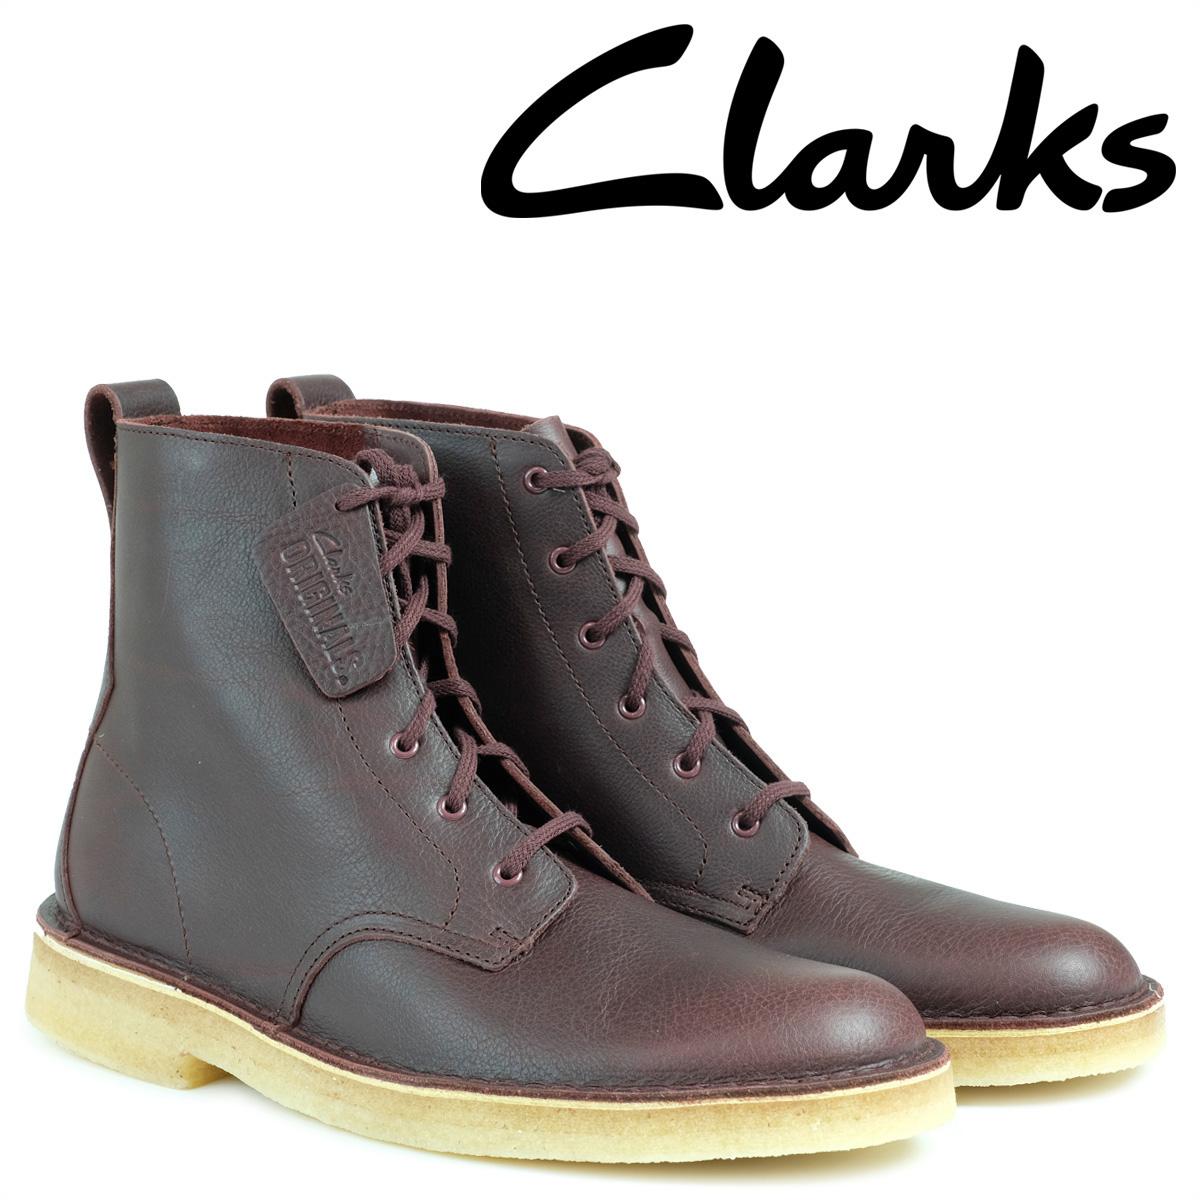 83d8f6f8 Kulaki Clarks desert boots men DESERT MALI Mali 26126186 burgundy